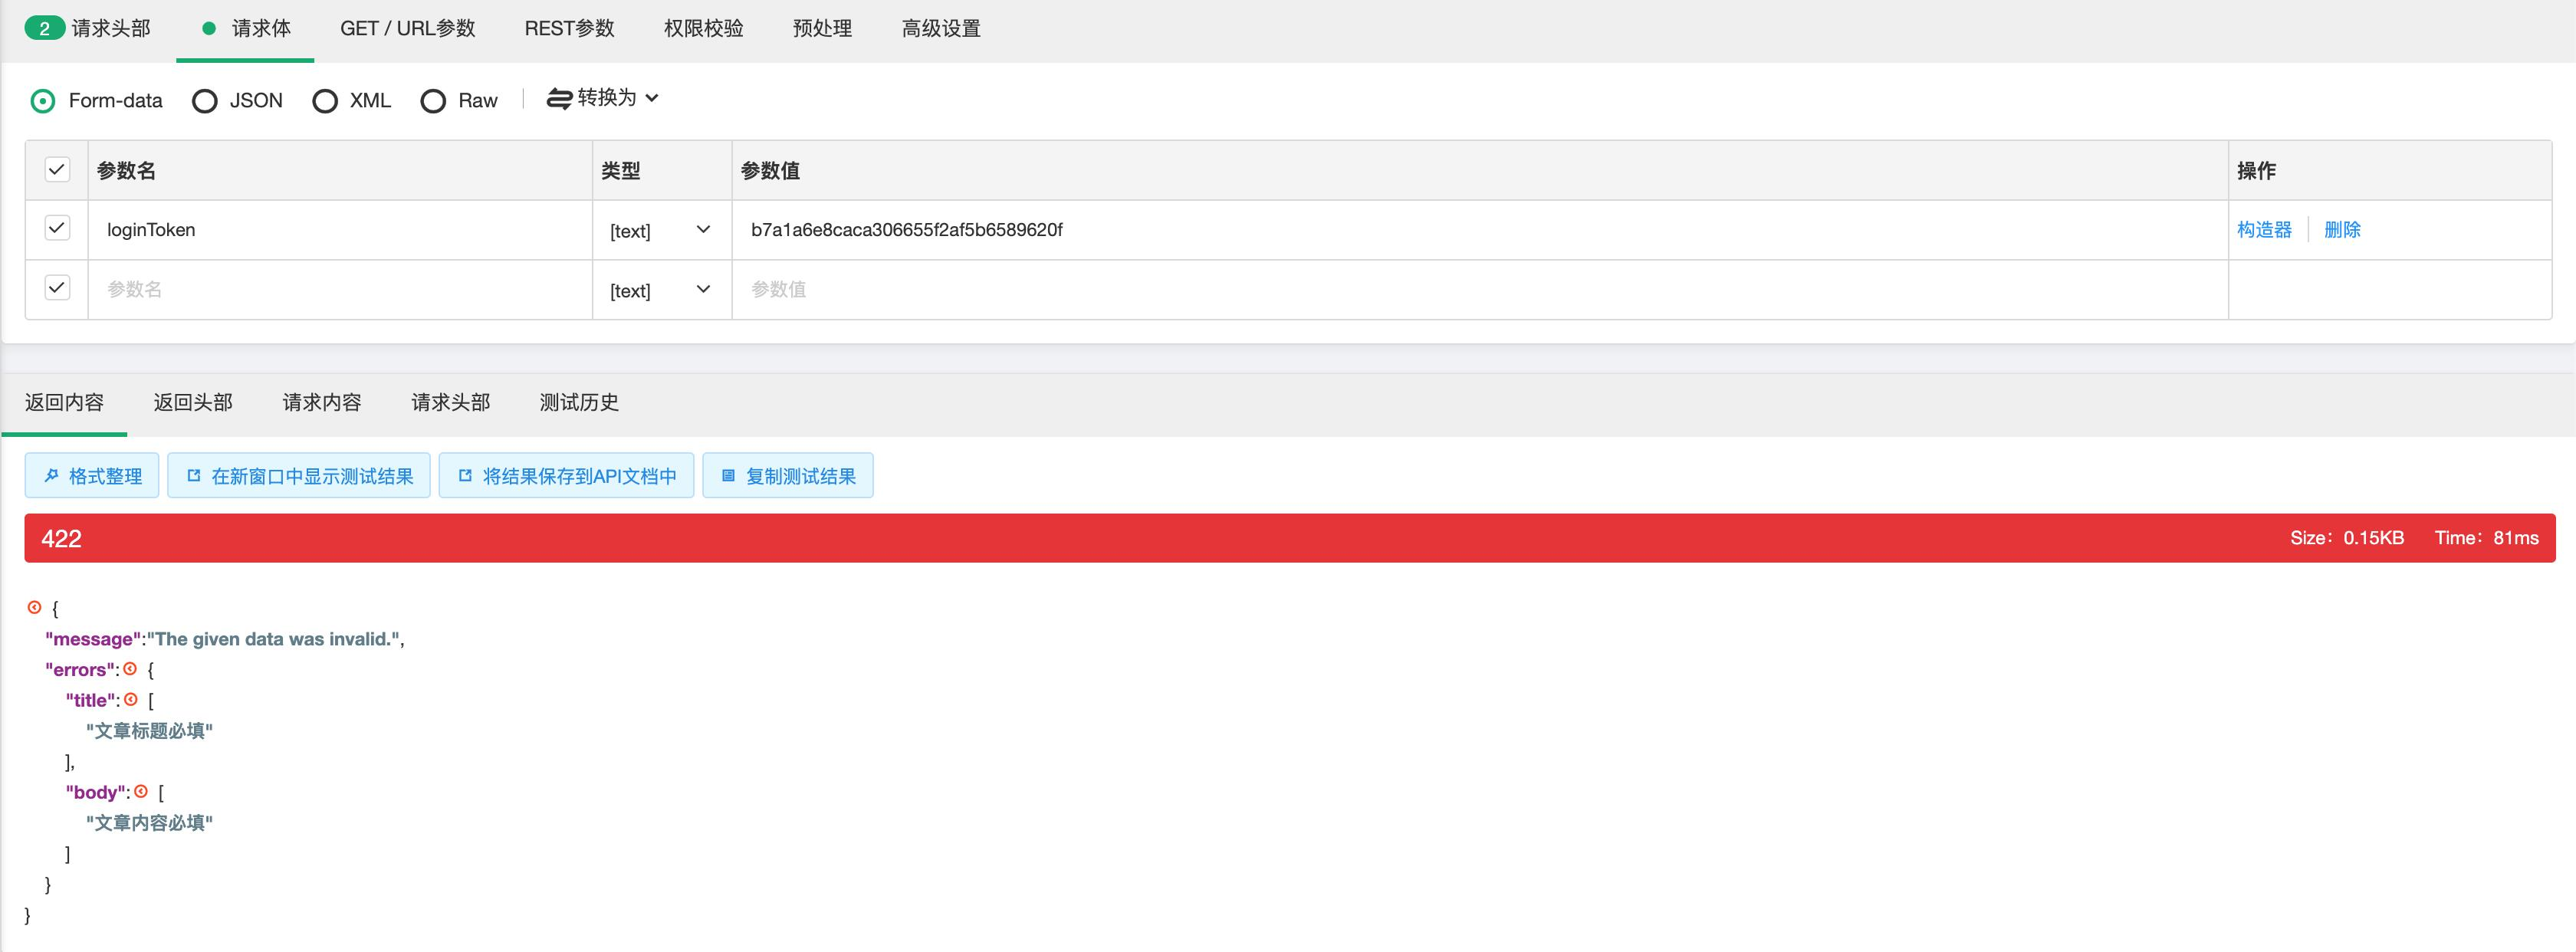 Laravel表单验证自定义json返回数据给是|8月更文挑战